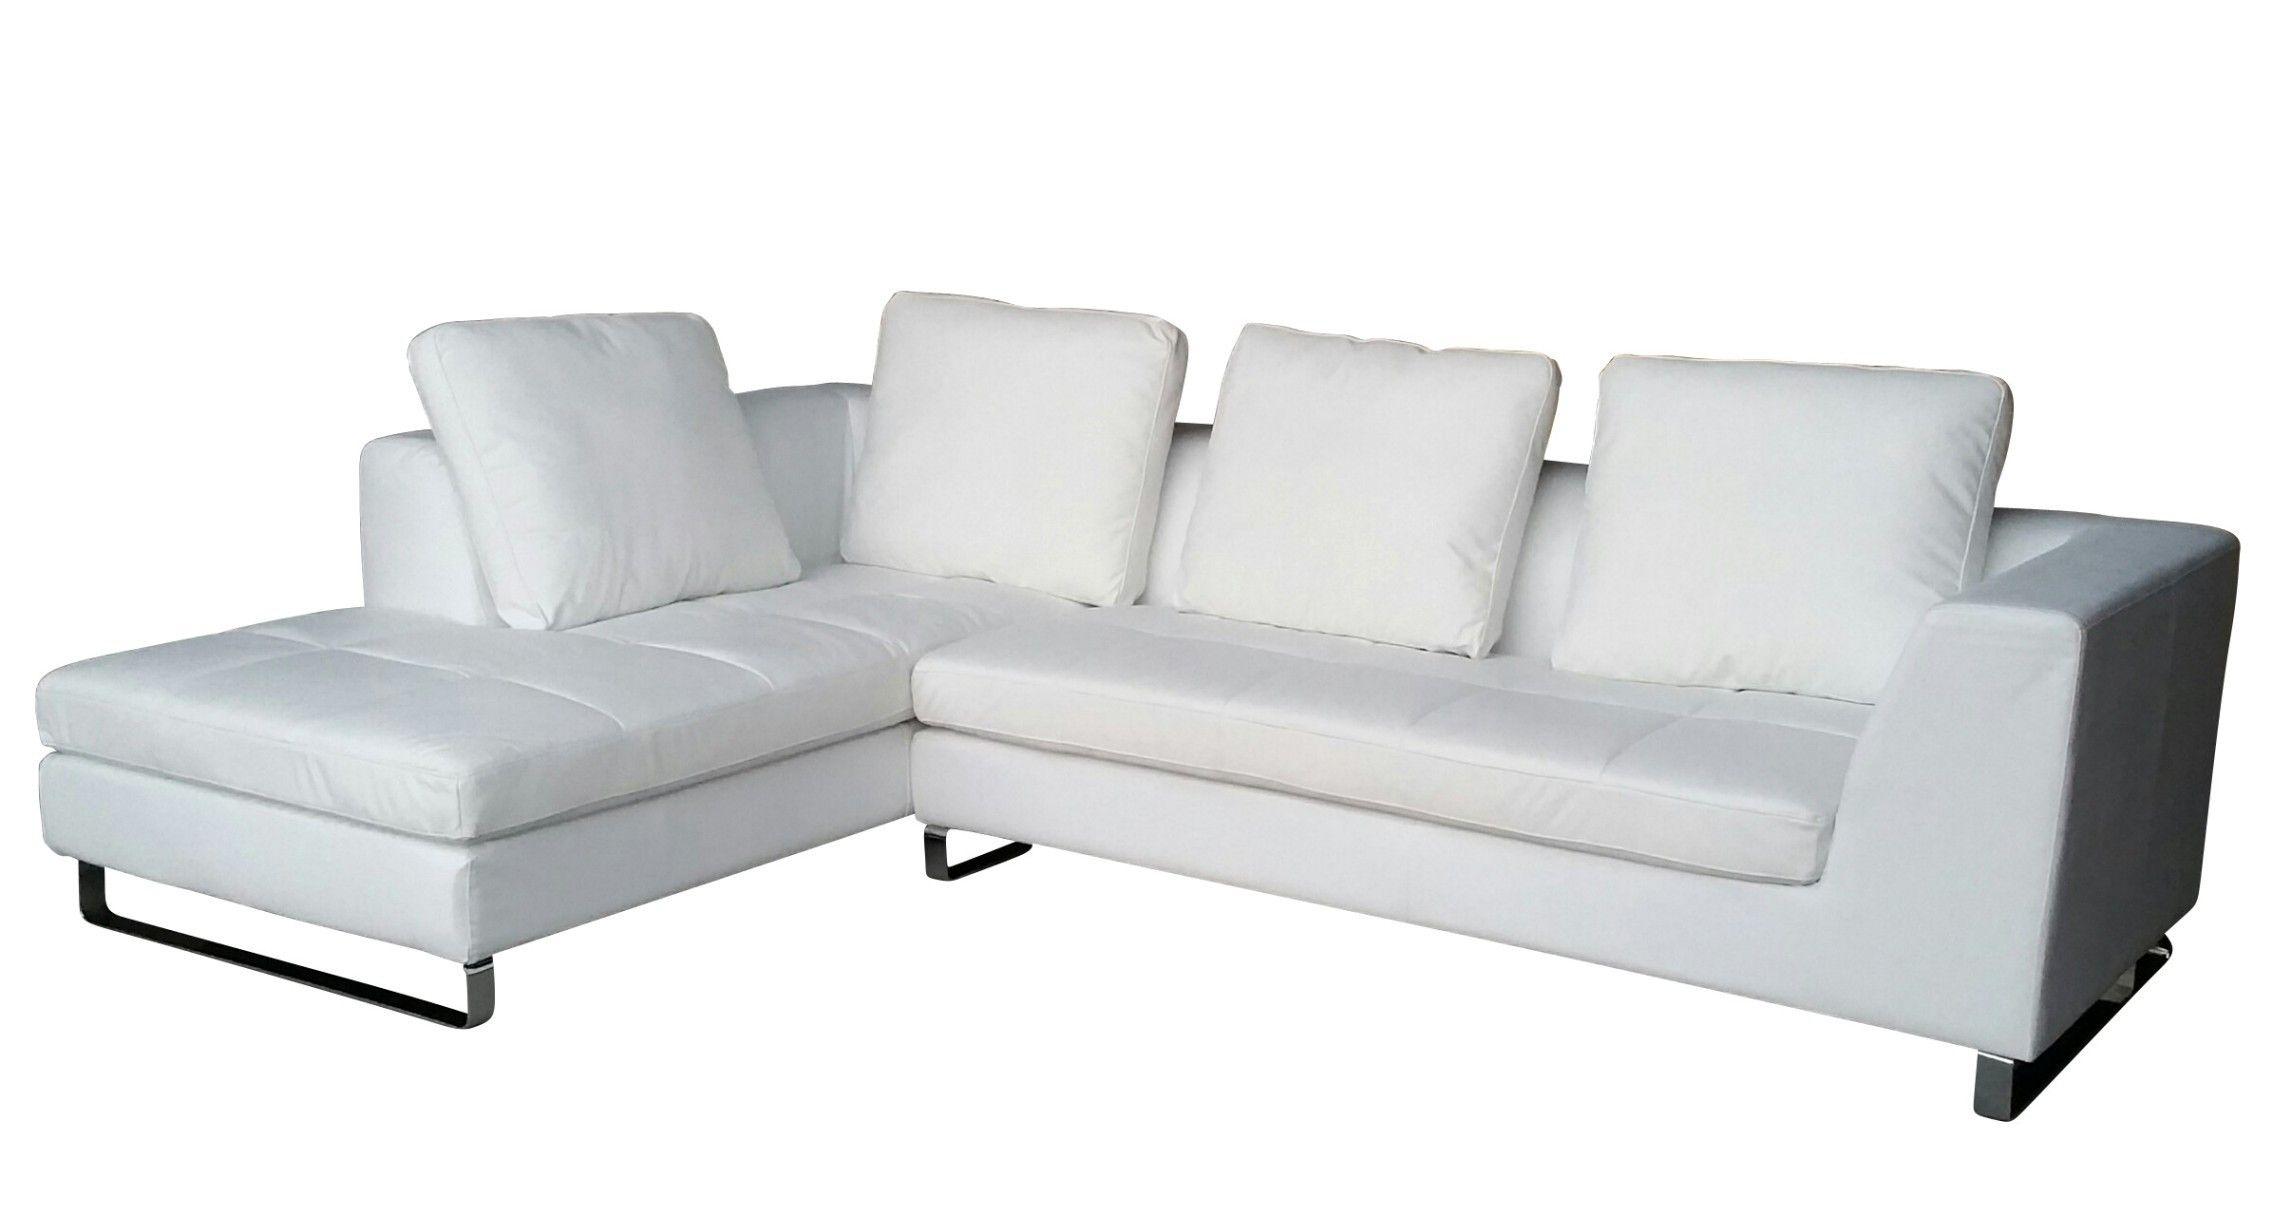 Sofa L Luxury Schon Ecksofa Grau Federkern Ecksofas L Form Zum Ecksofa Federkern Beige Living Rooms Big Sofas Modern Couch